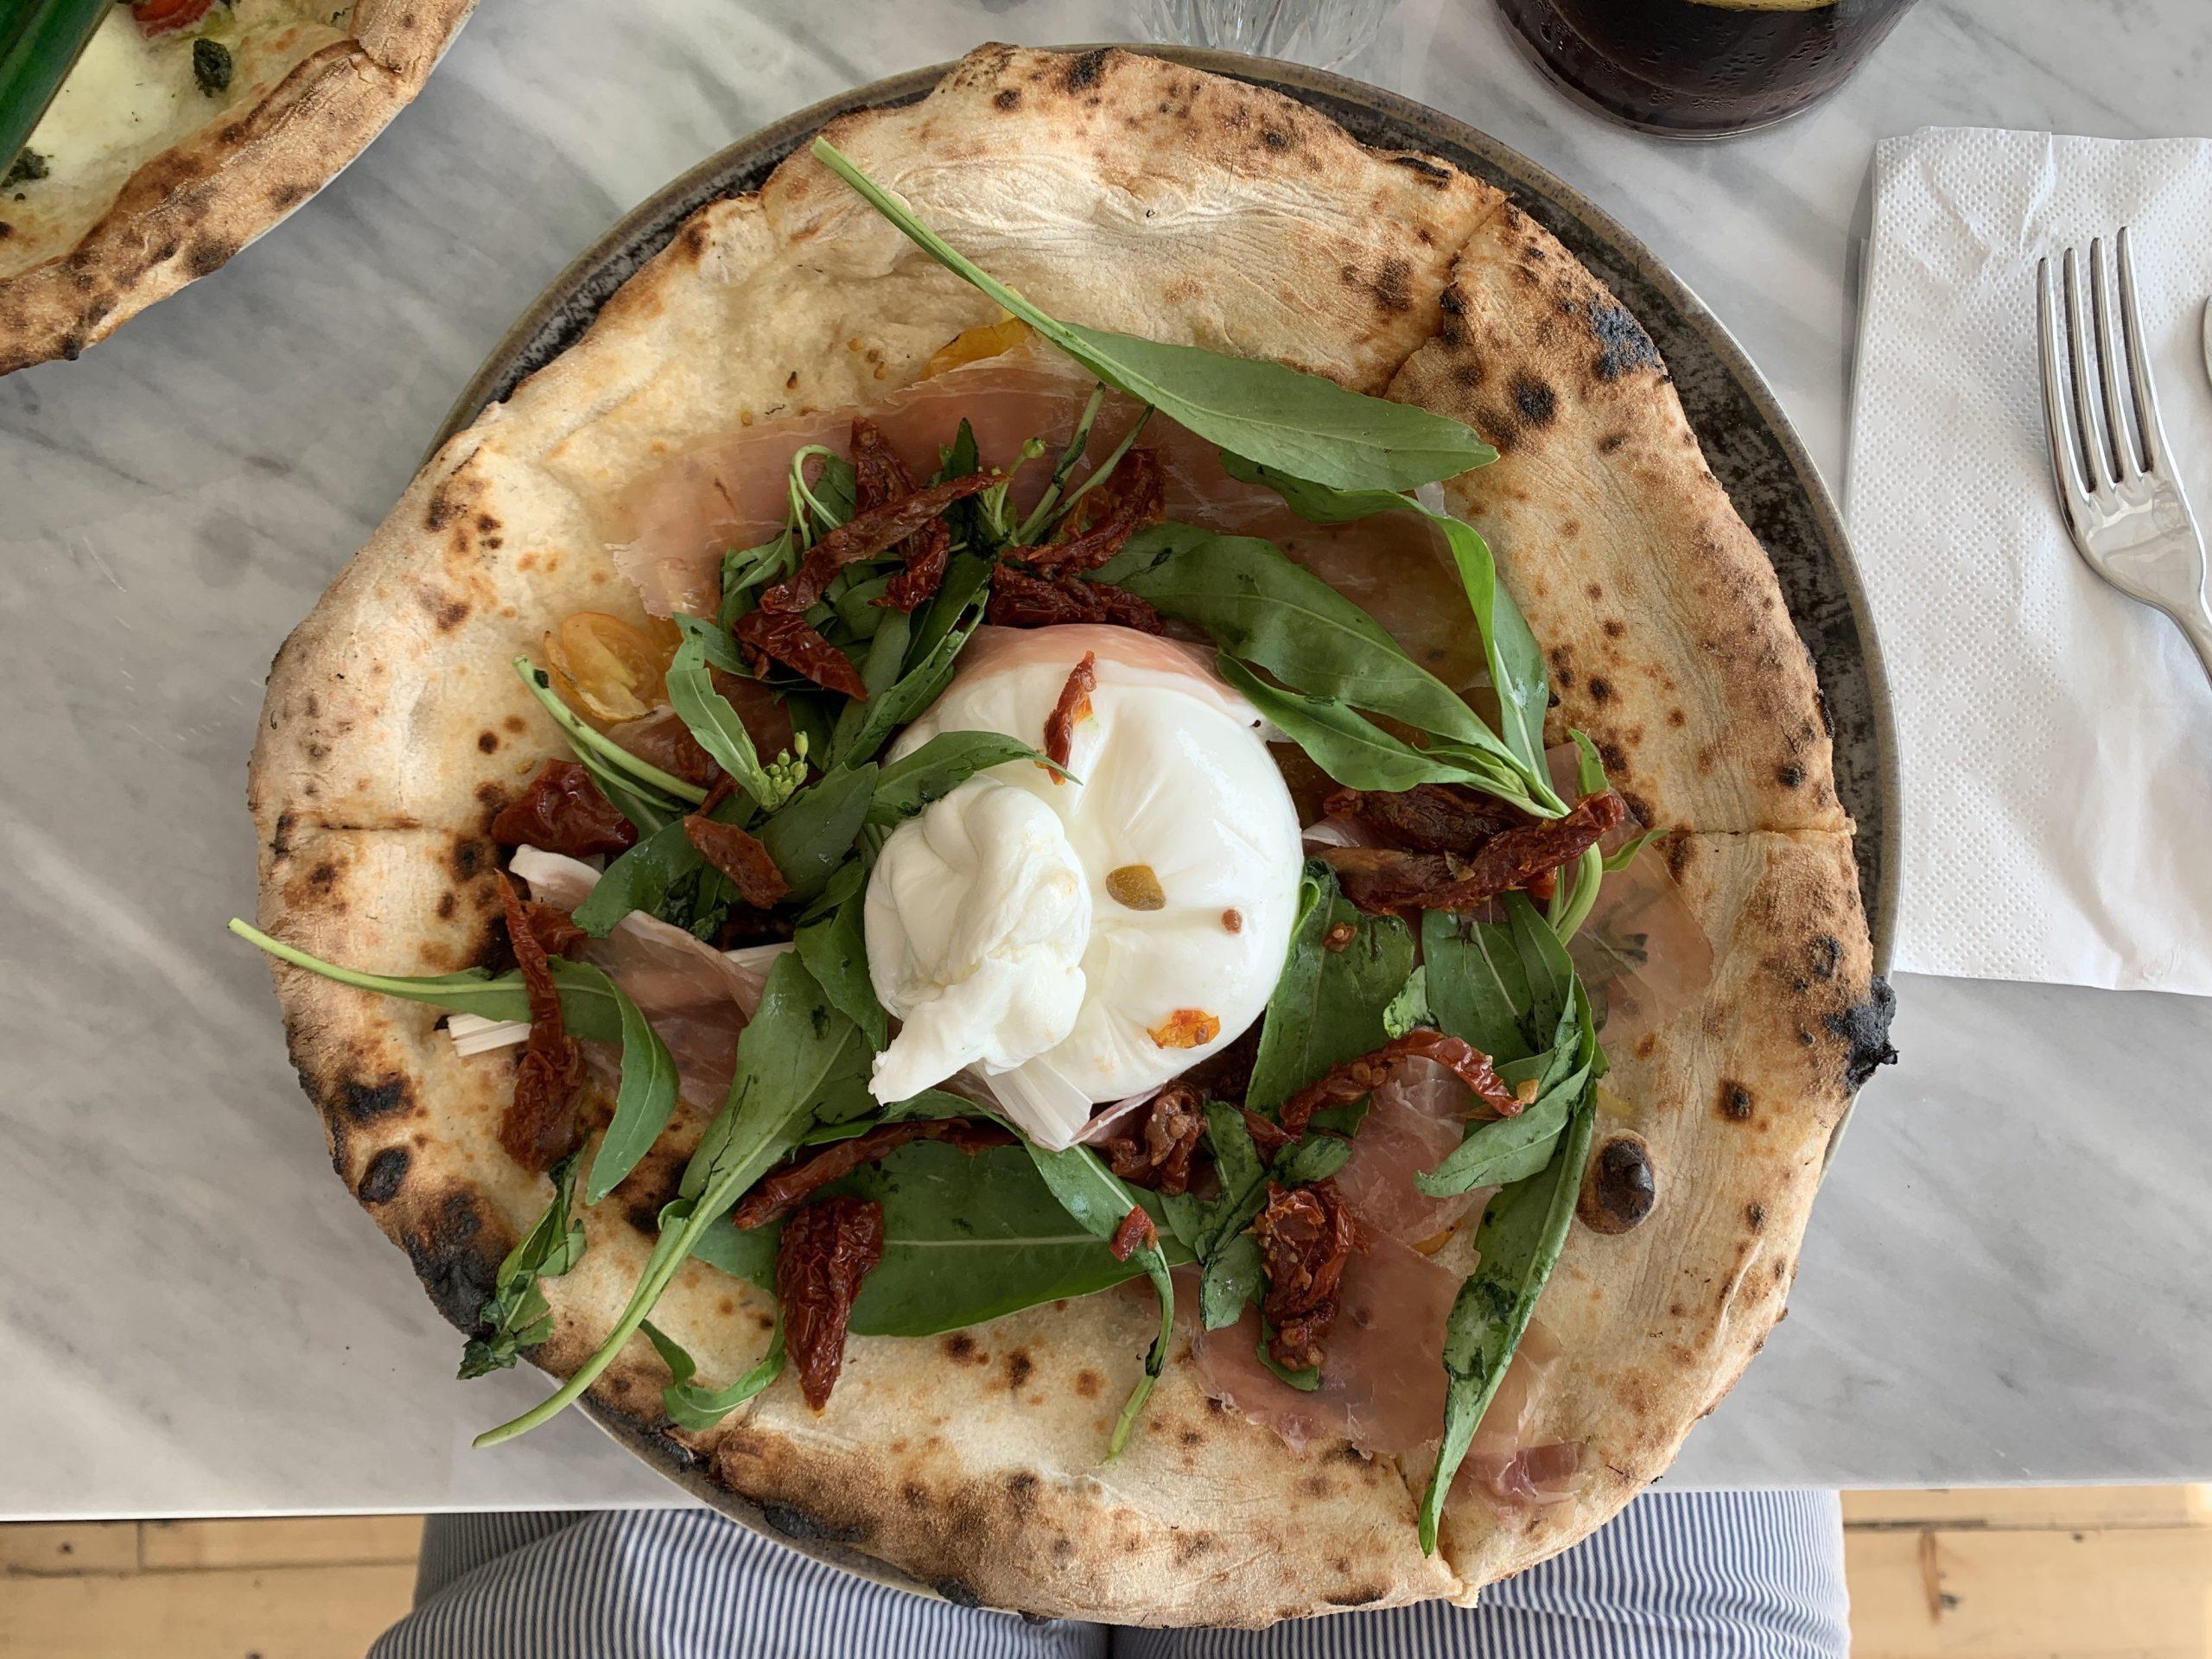 Pizza con datterini gialli (Pizzeria Pisani, Pozzuoli)